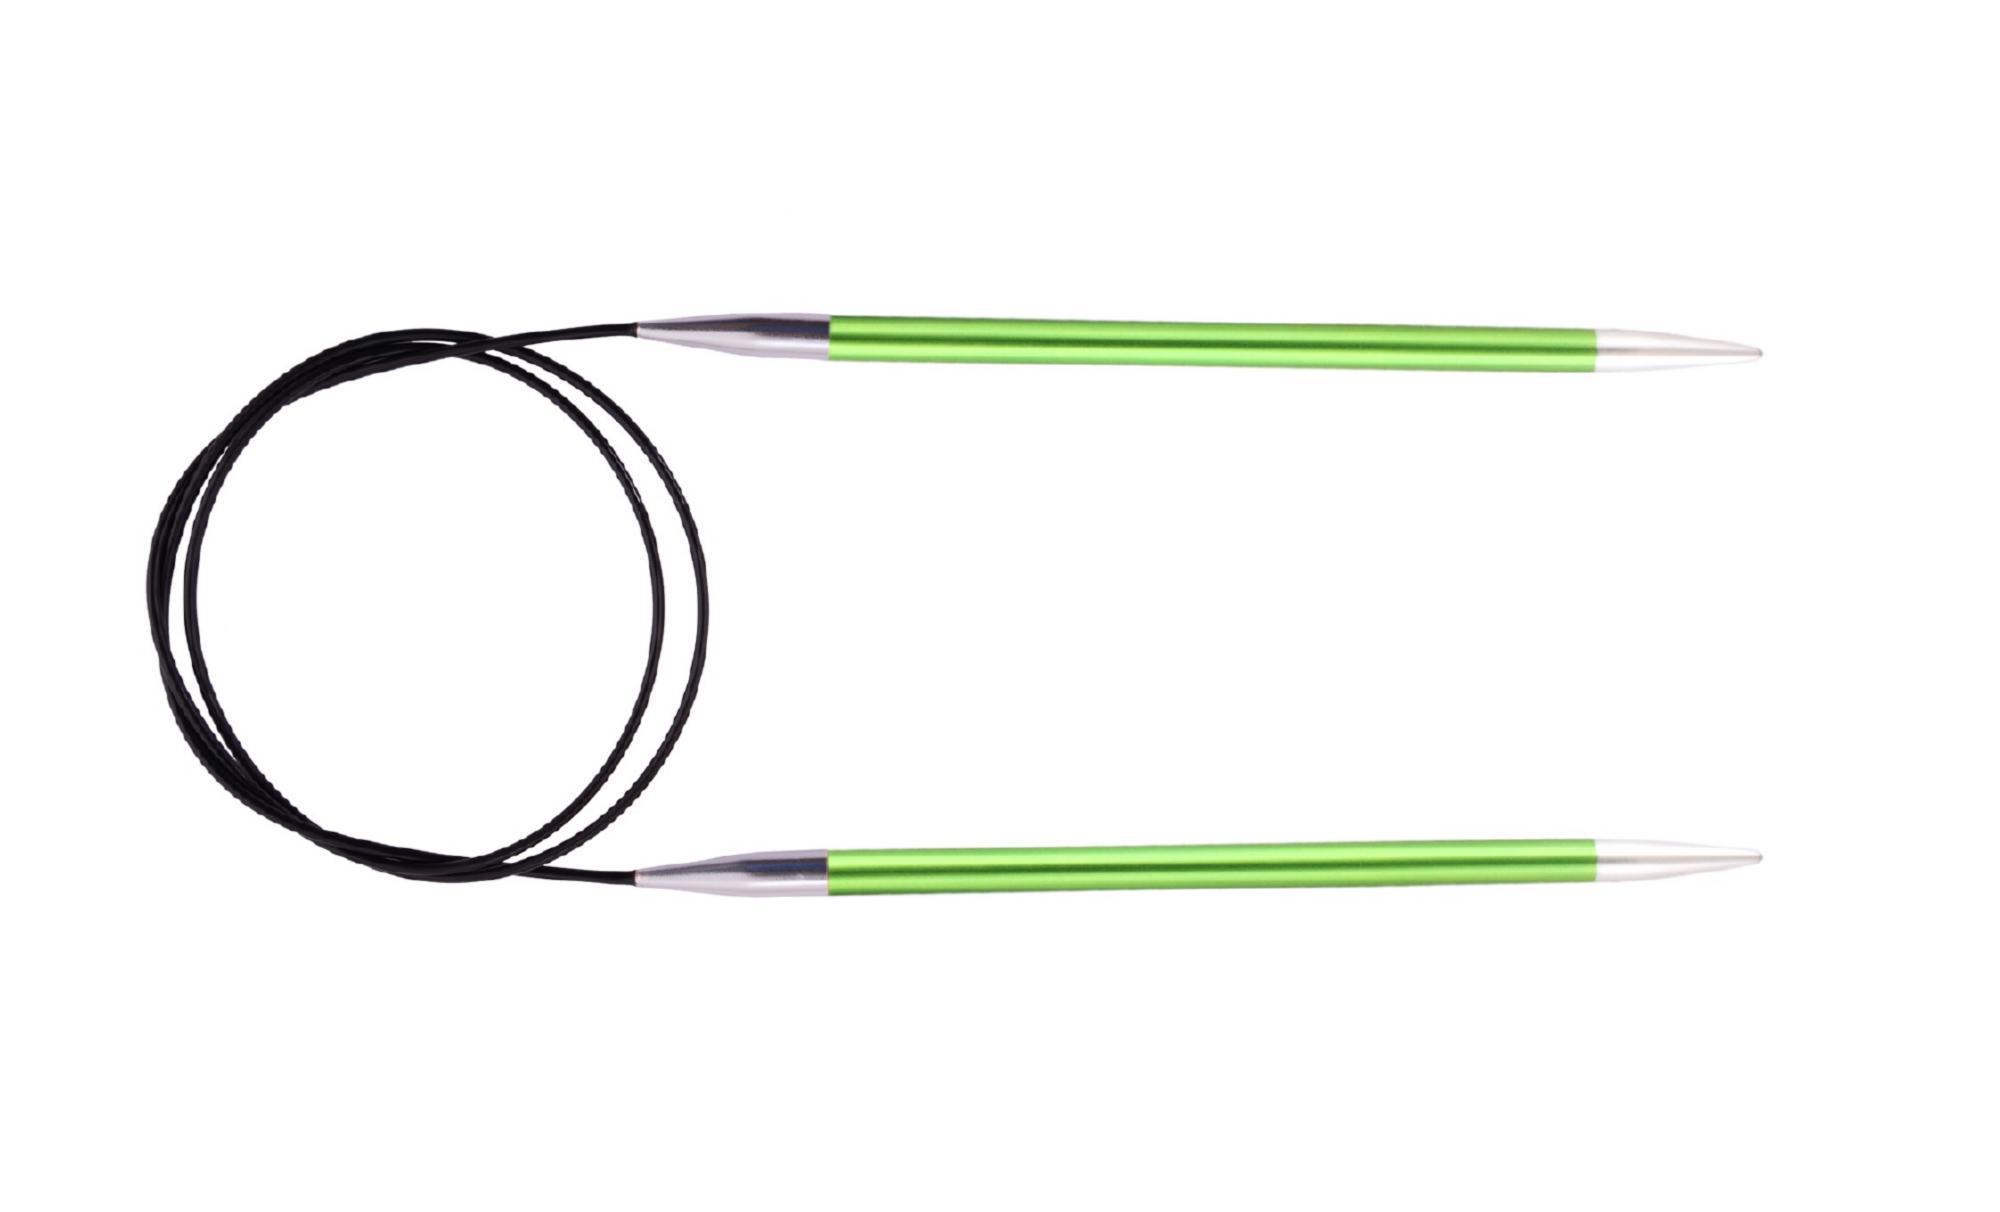 Спицы круговые 40 см Zing KnitPro, 47067, 3.50 мм